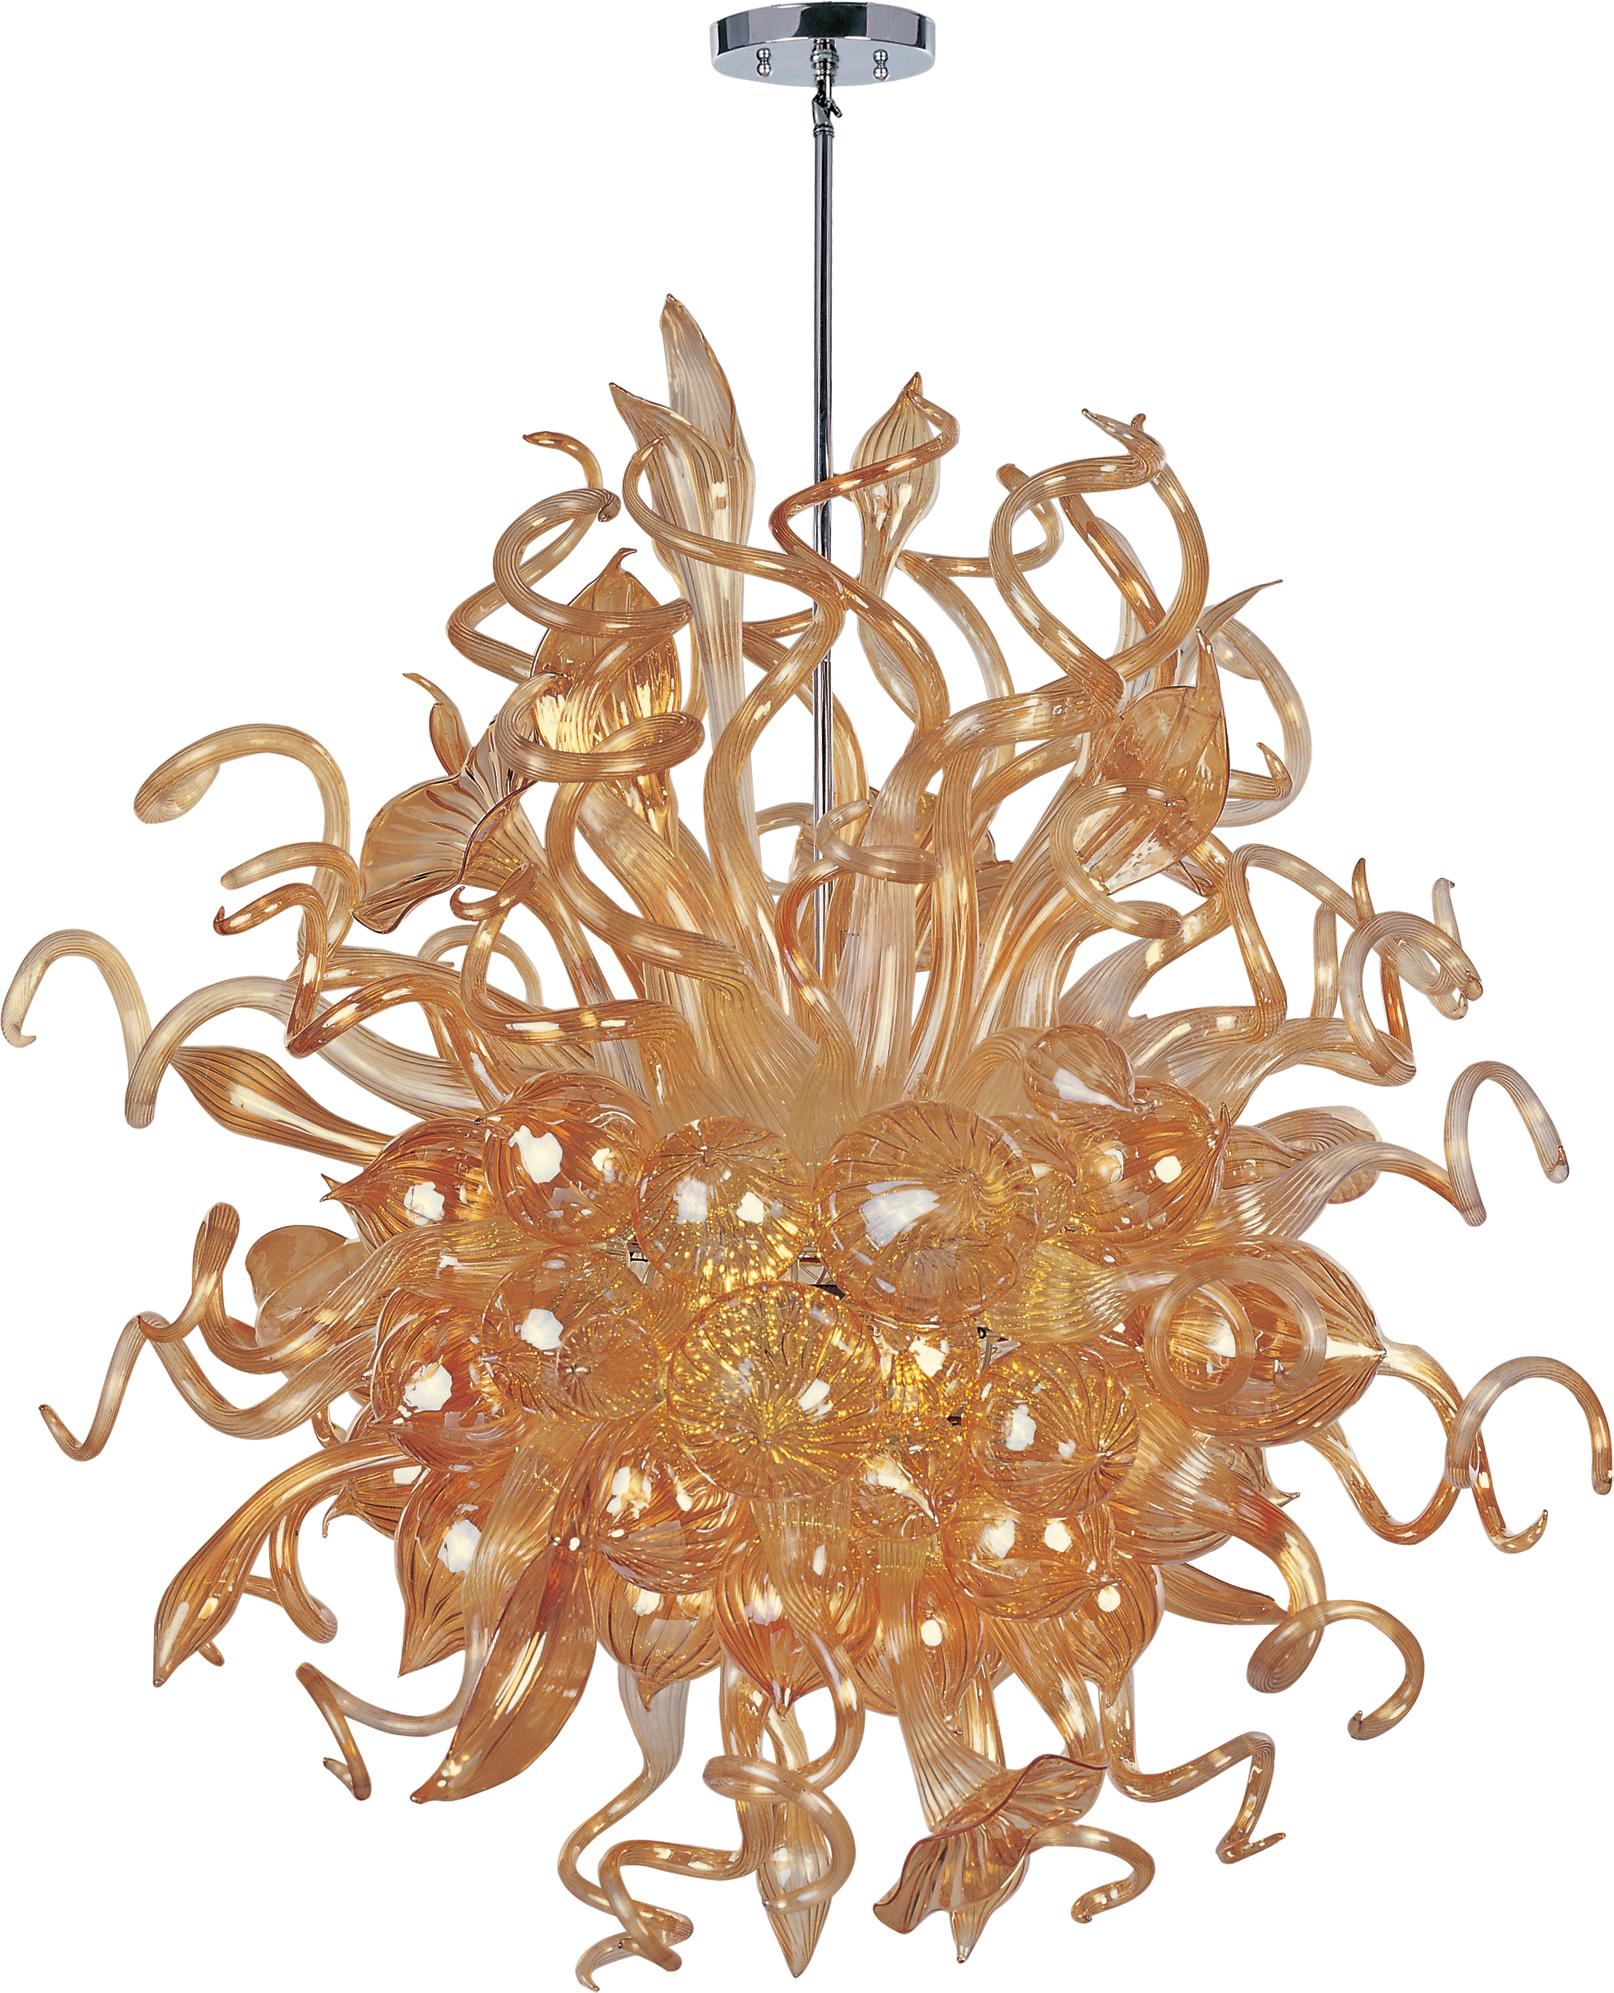 Mimi led 18 light chandelier multi tier chandelier maxim lighting mimi led mimi led 18 light chandelier mozeypictures Images